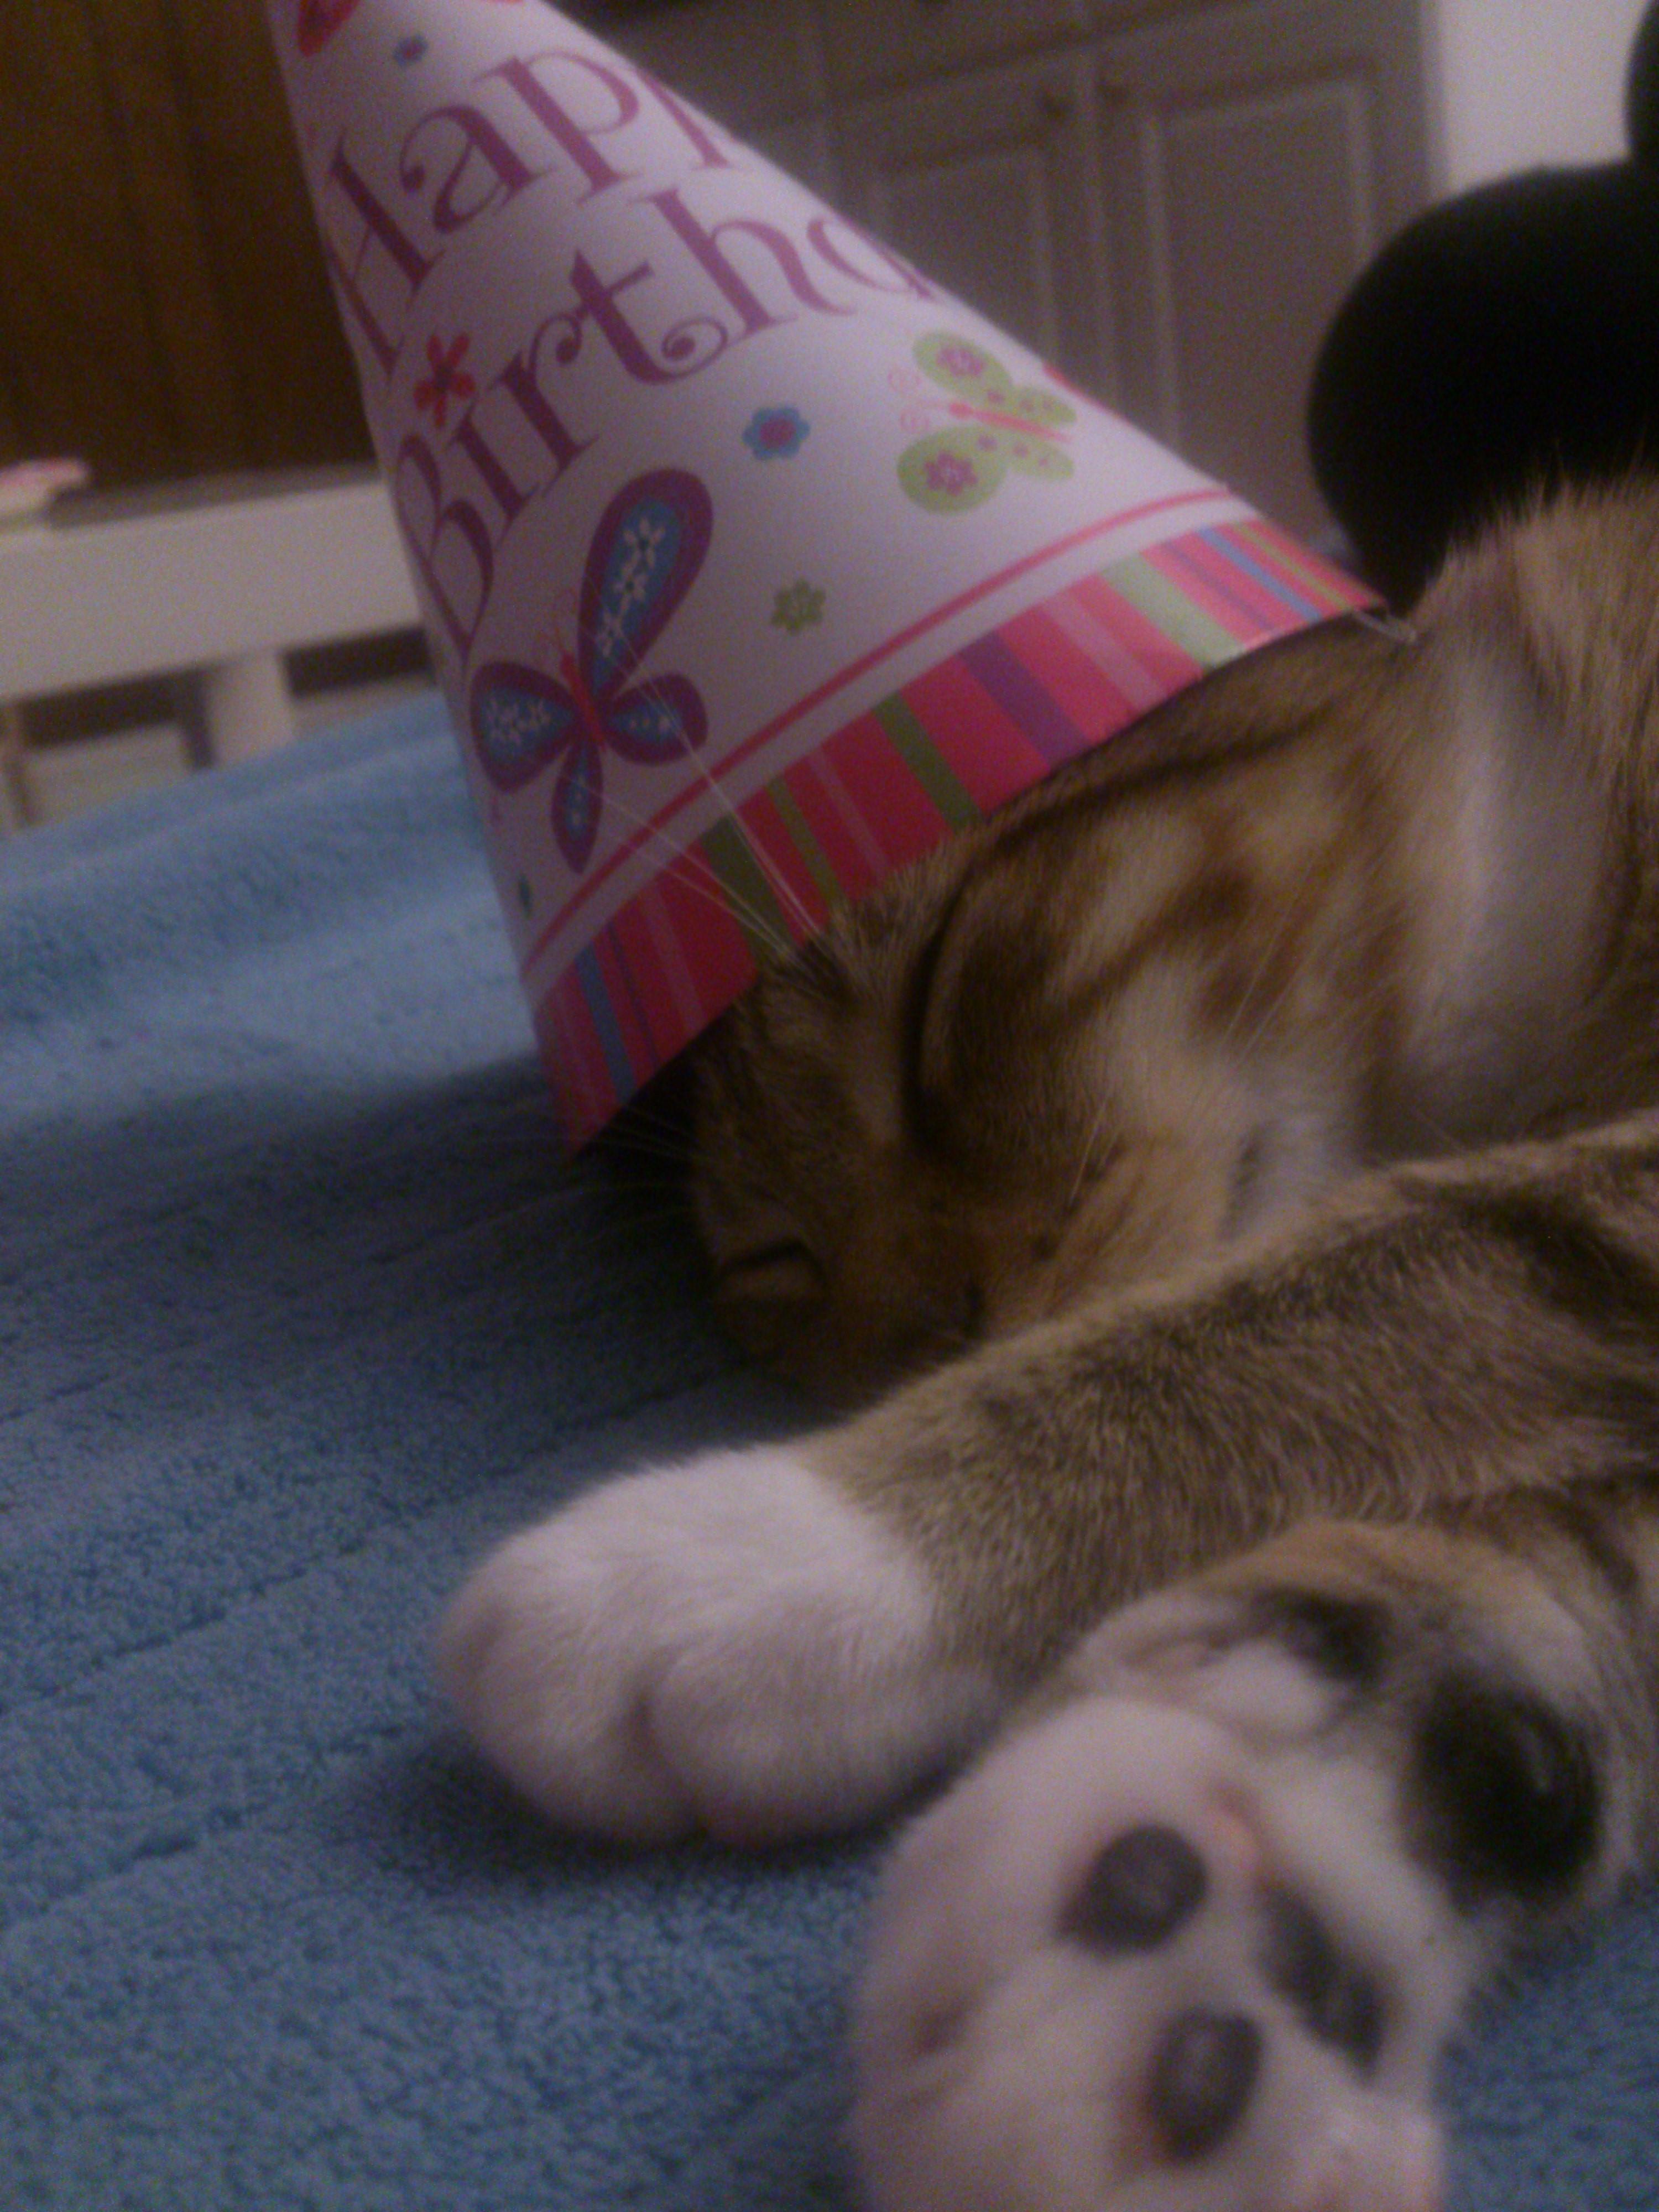 Happy Birthday Scorpio Girl 生日快樂 happy birthday,